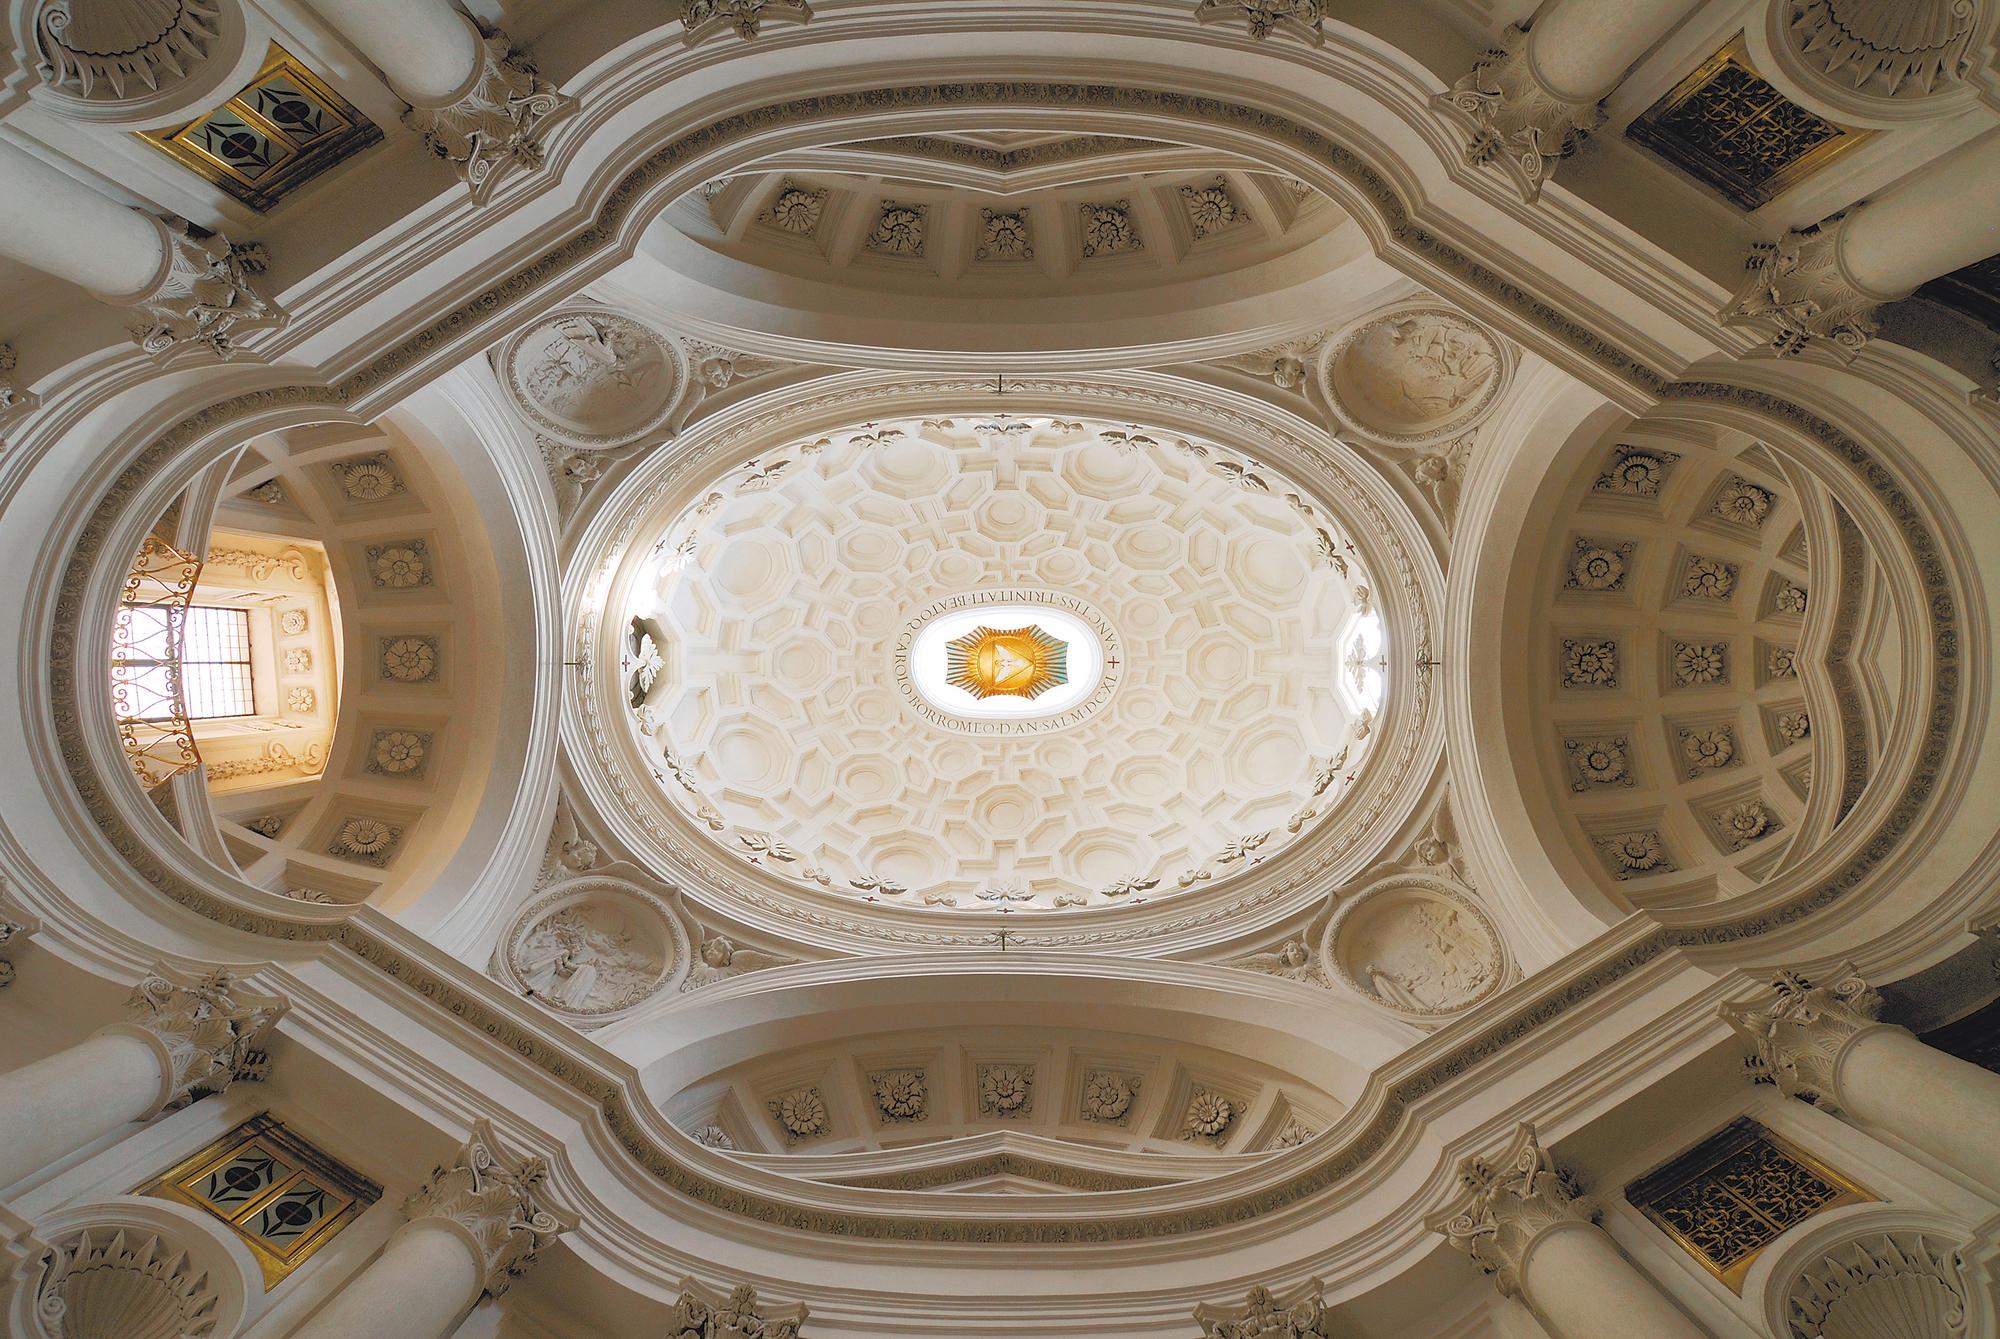 San Carlo Alle Quattro Fontane Madness Or Masterpiece